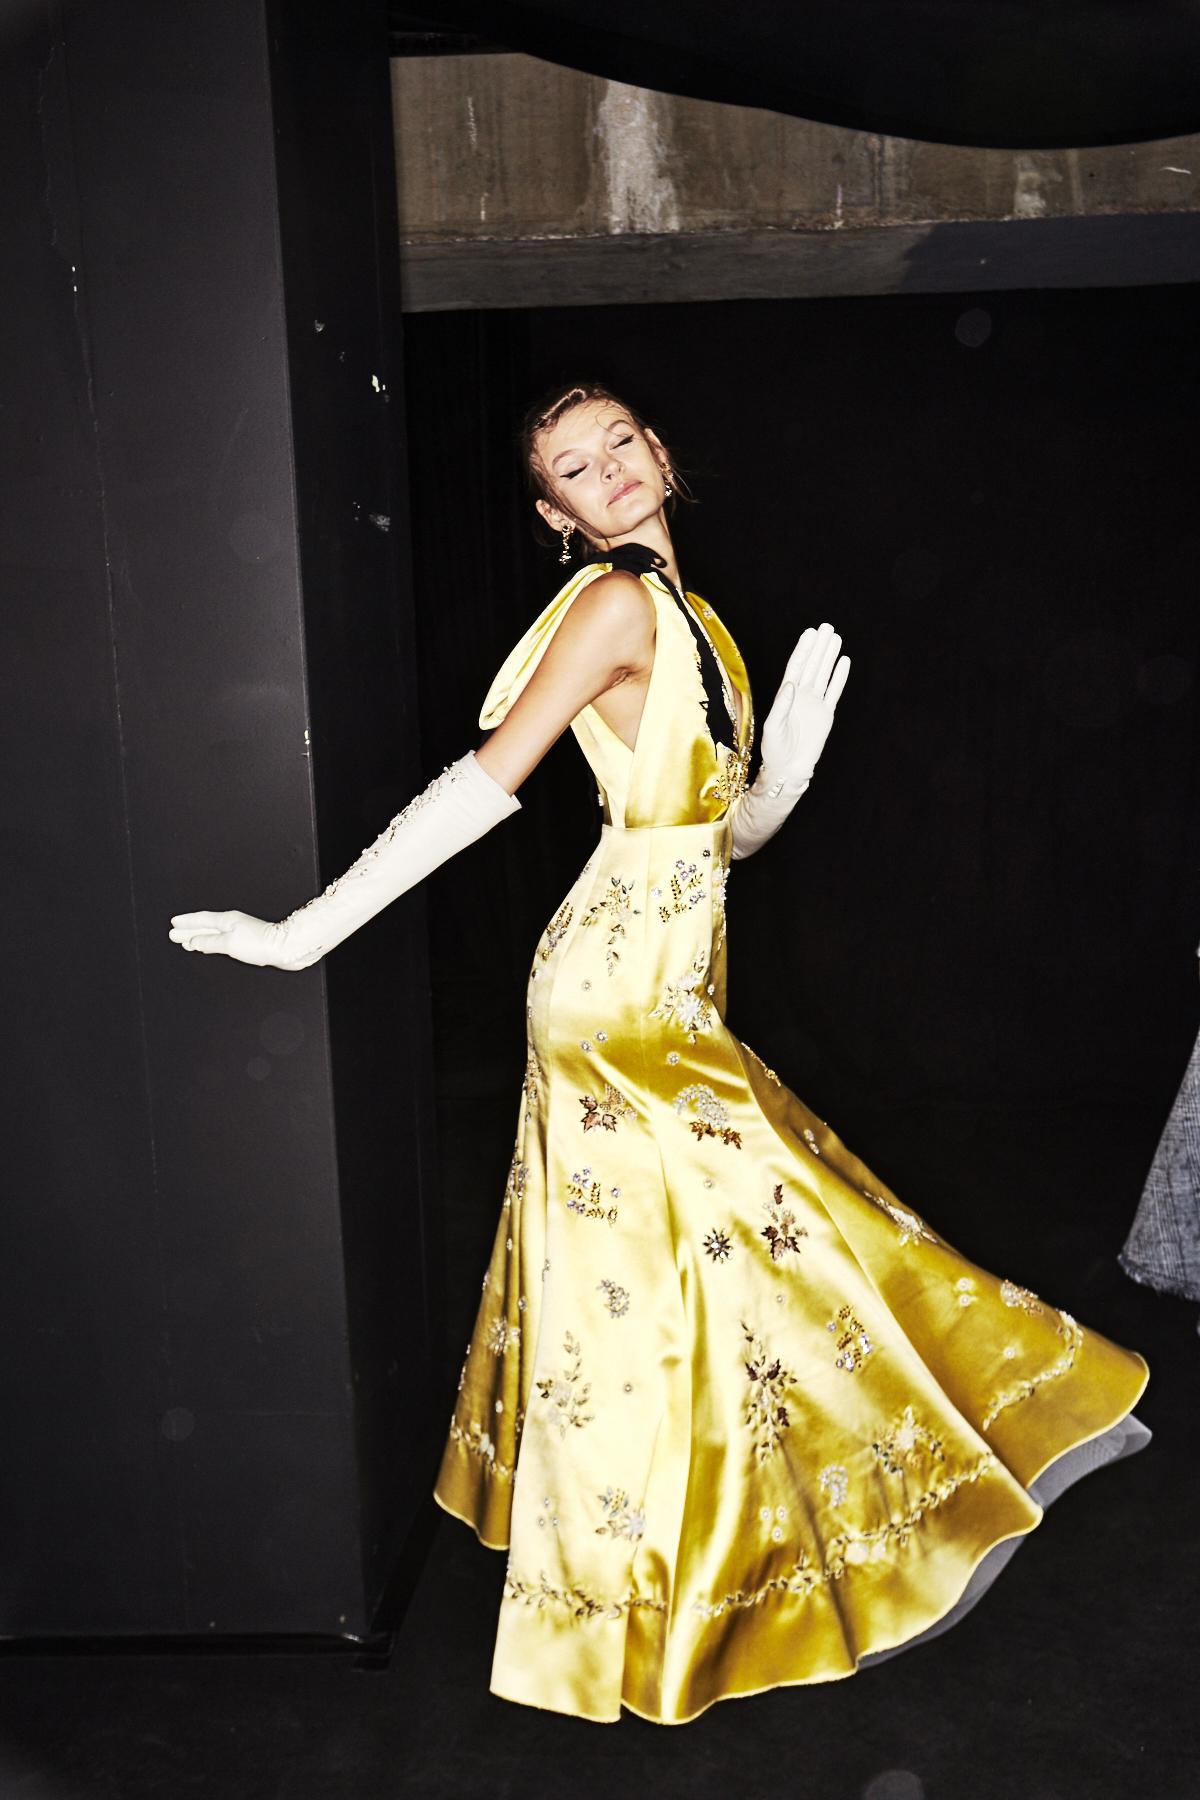 Erdem SS18 London Fashion Show Backstage